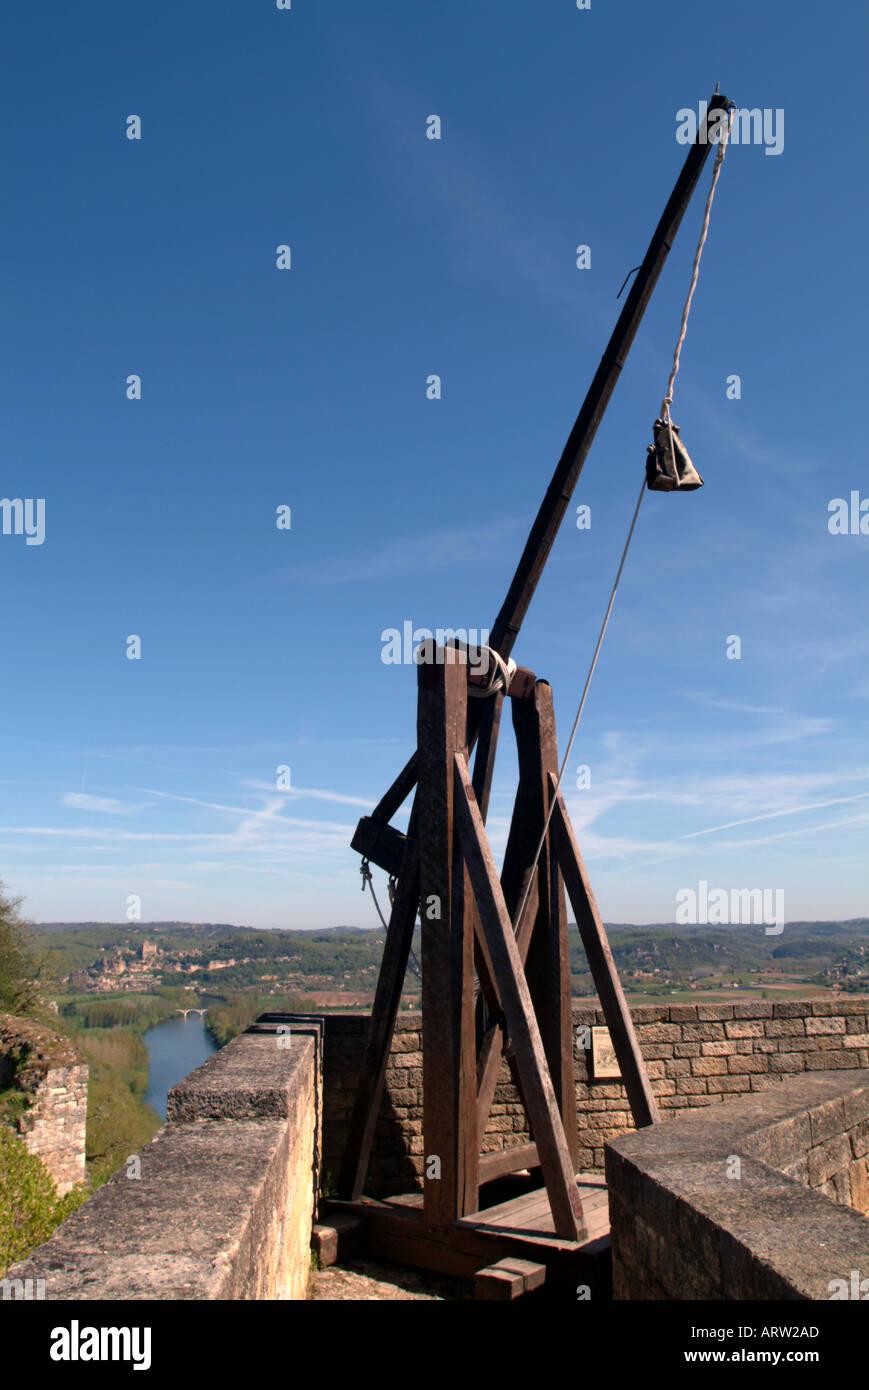 Trebuchet medieval catapult Castelnaud castle Dordogne France Stock Photo